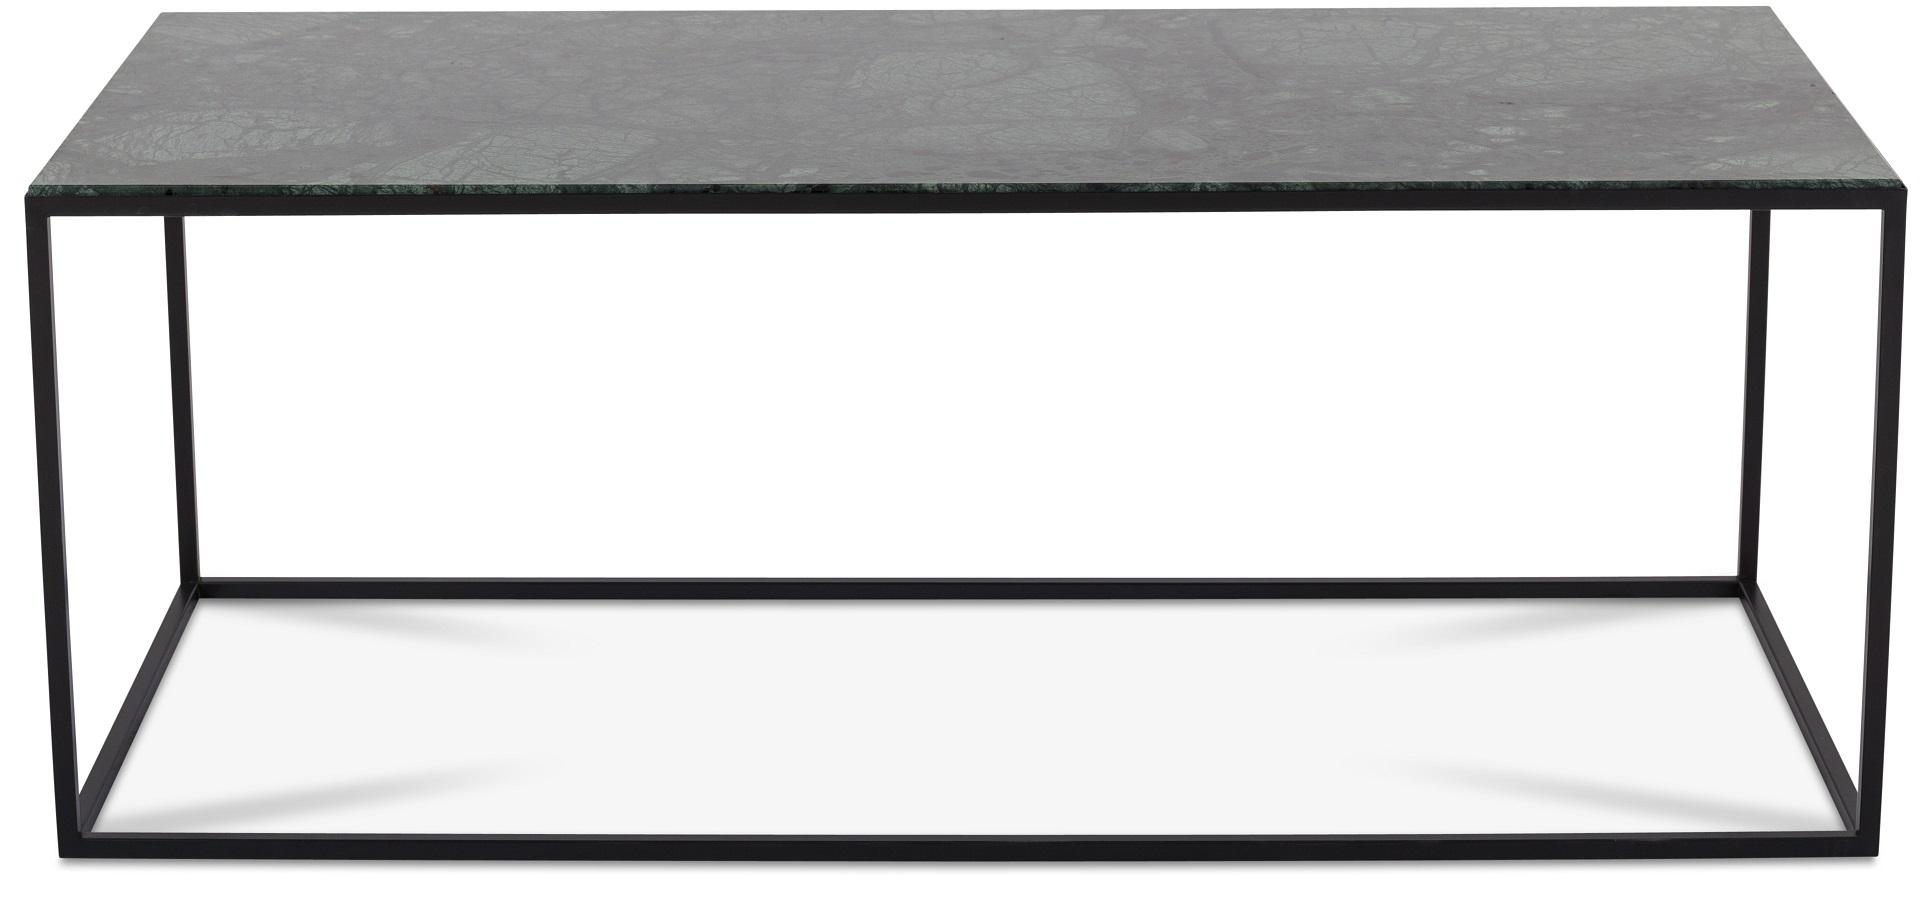 Carrera soffbord 125 cm Grön Marmor Svart 3695 kr Trendrum se